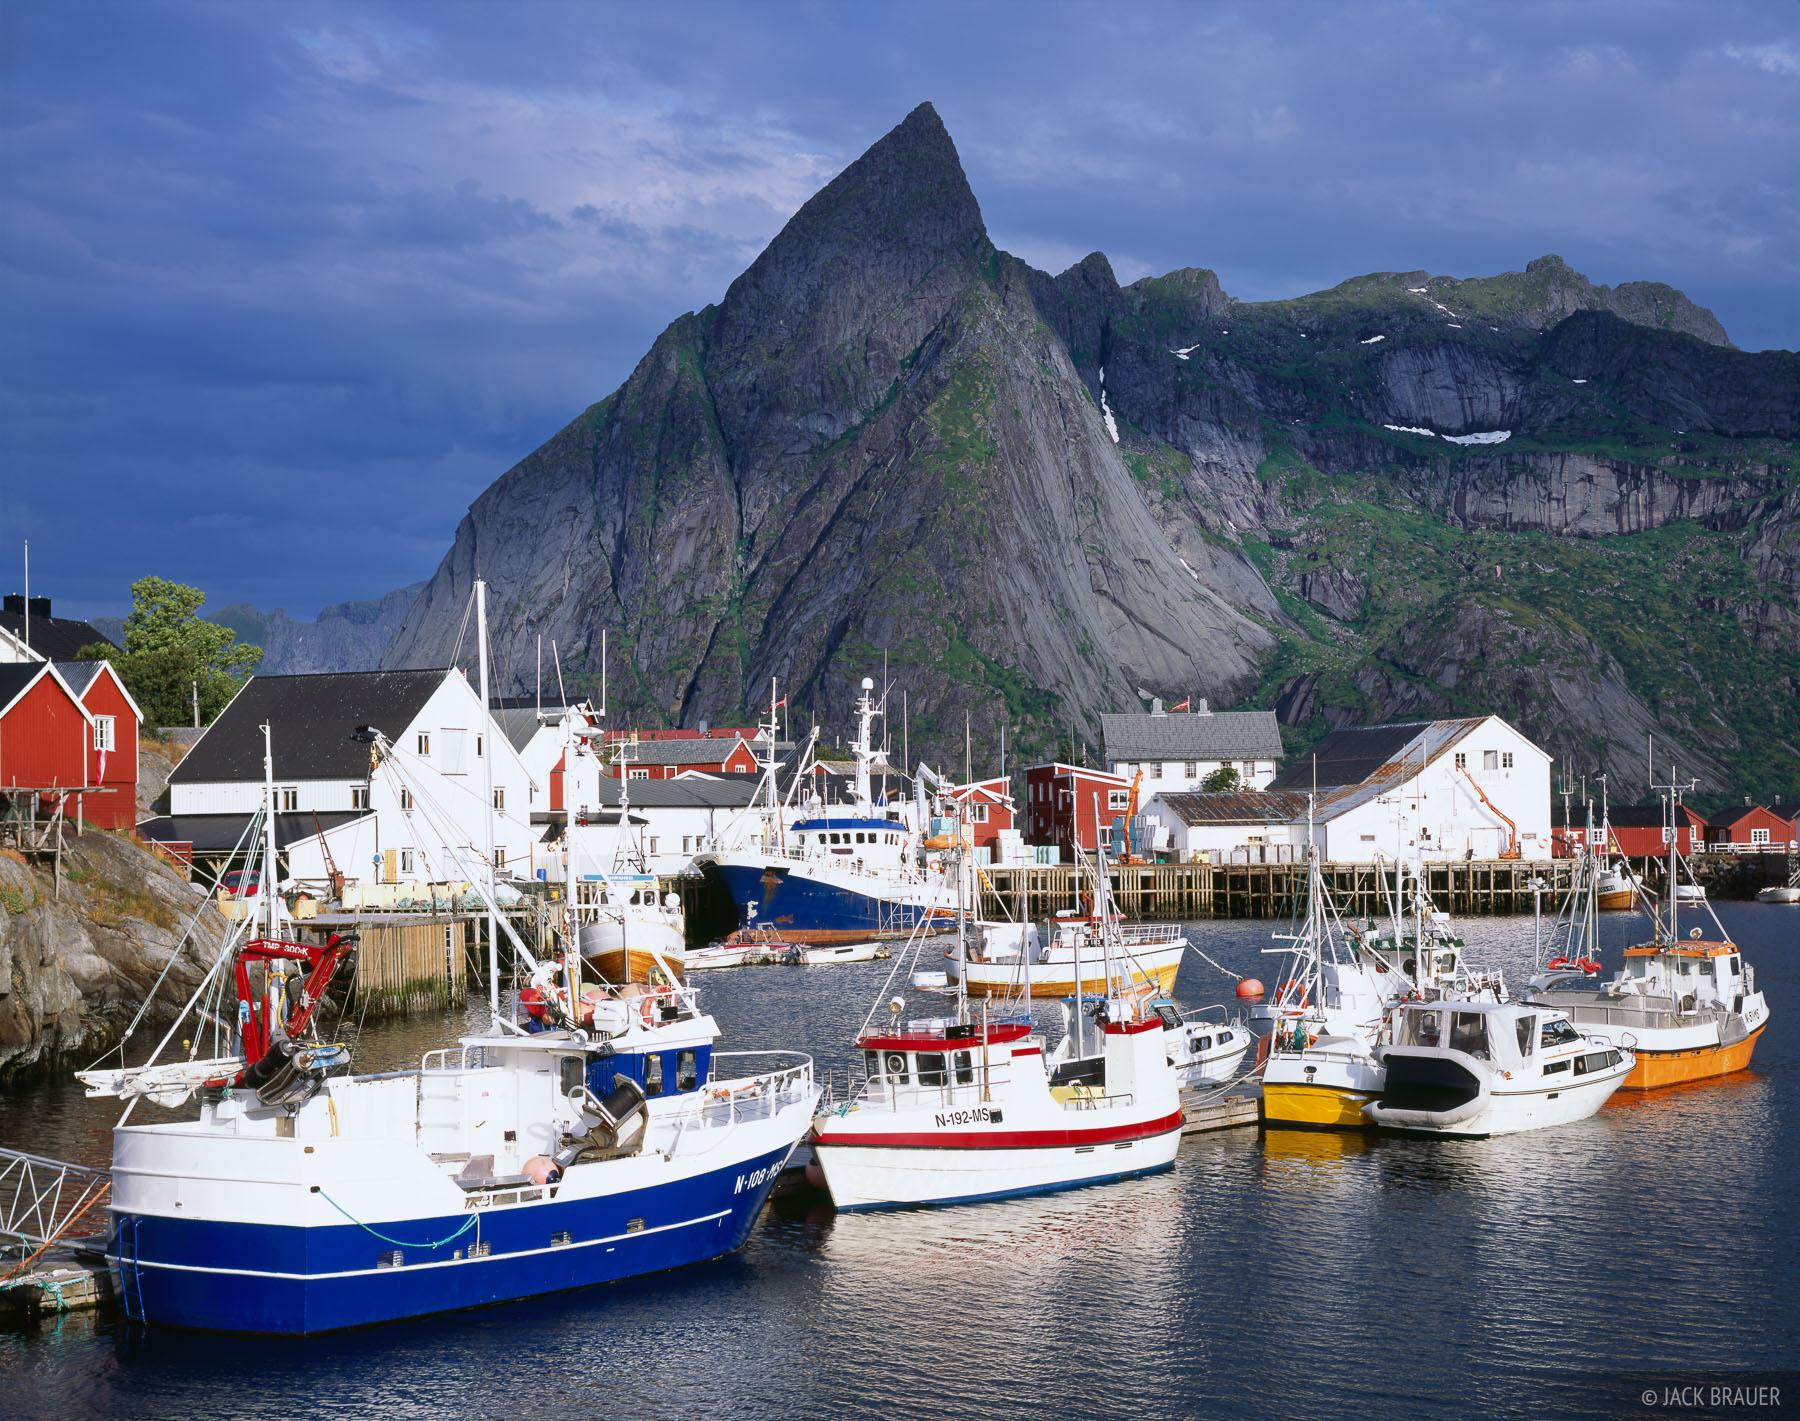 Hamnøya, Moskenesøya, Lofoten, Norway, boats, photo